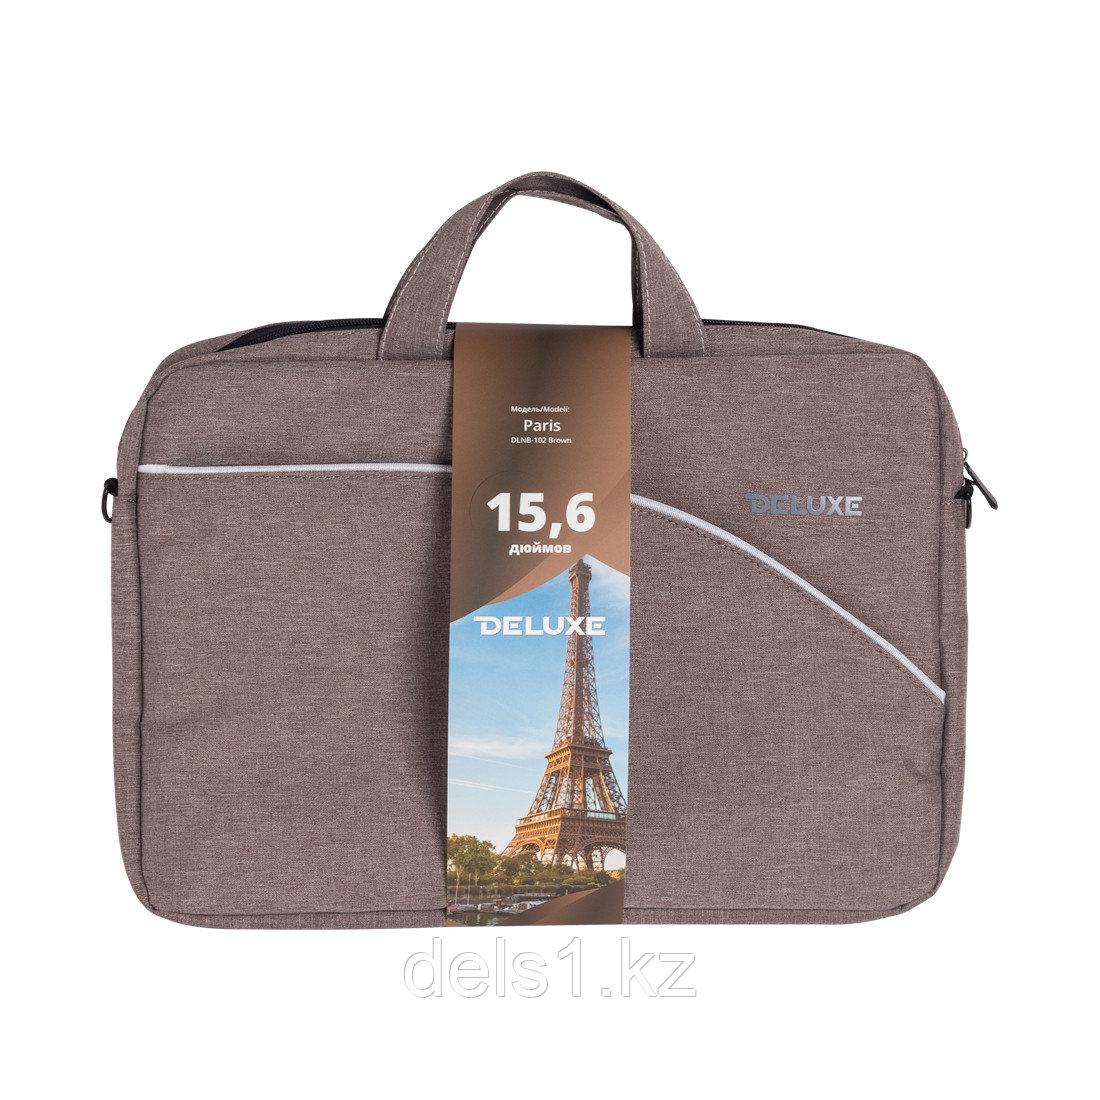 "Сумка для ноутбука Deluxe Paris 15.6"""